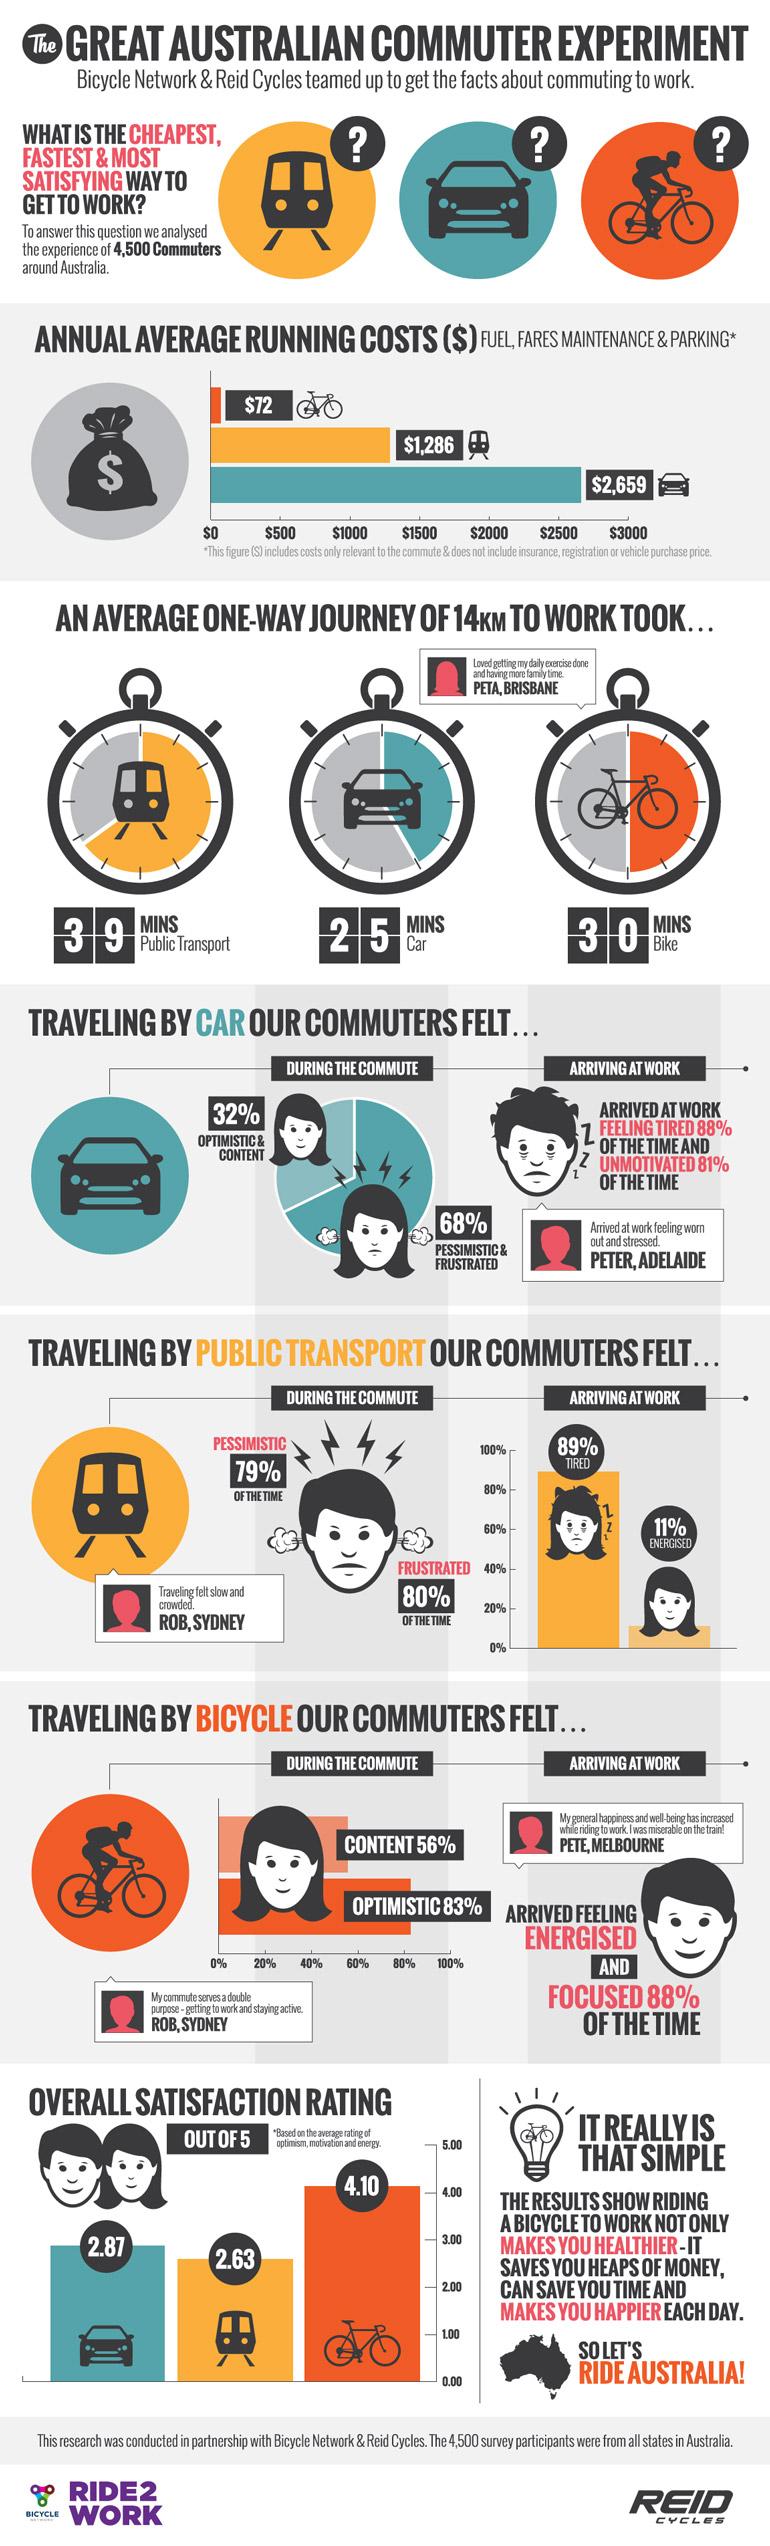 greatcommuterexperiment-infographic